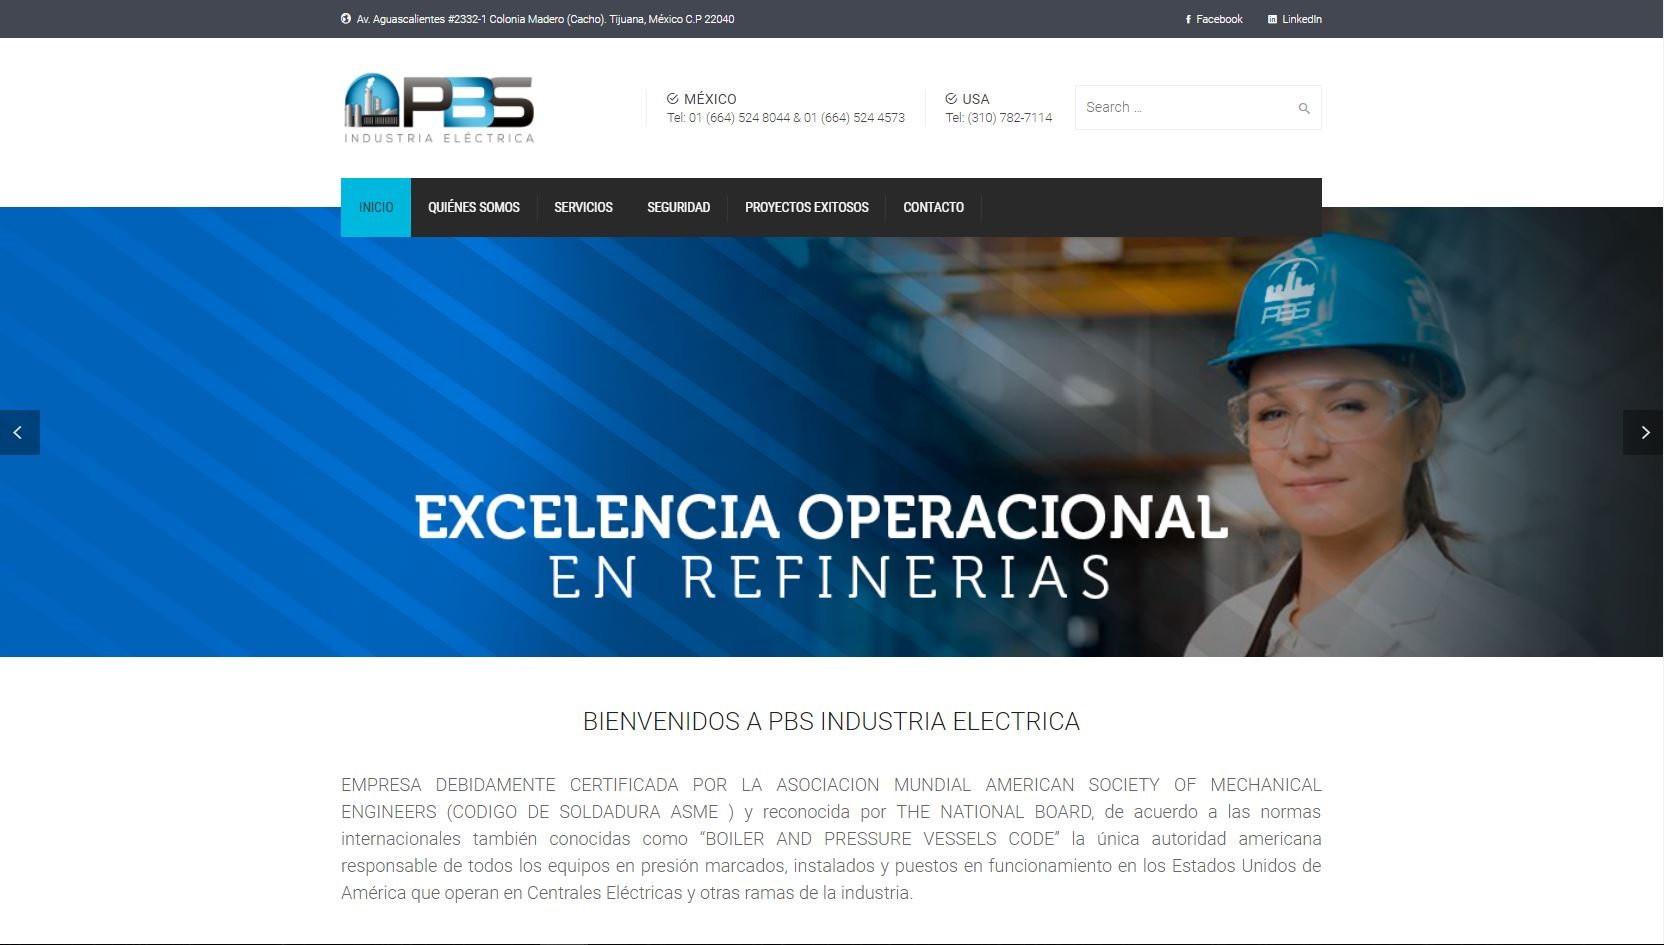 PBS Industria Eléctrica